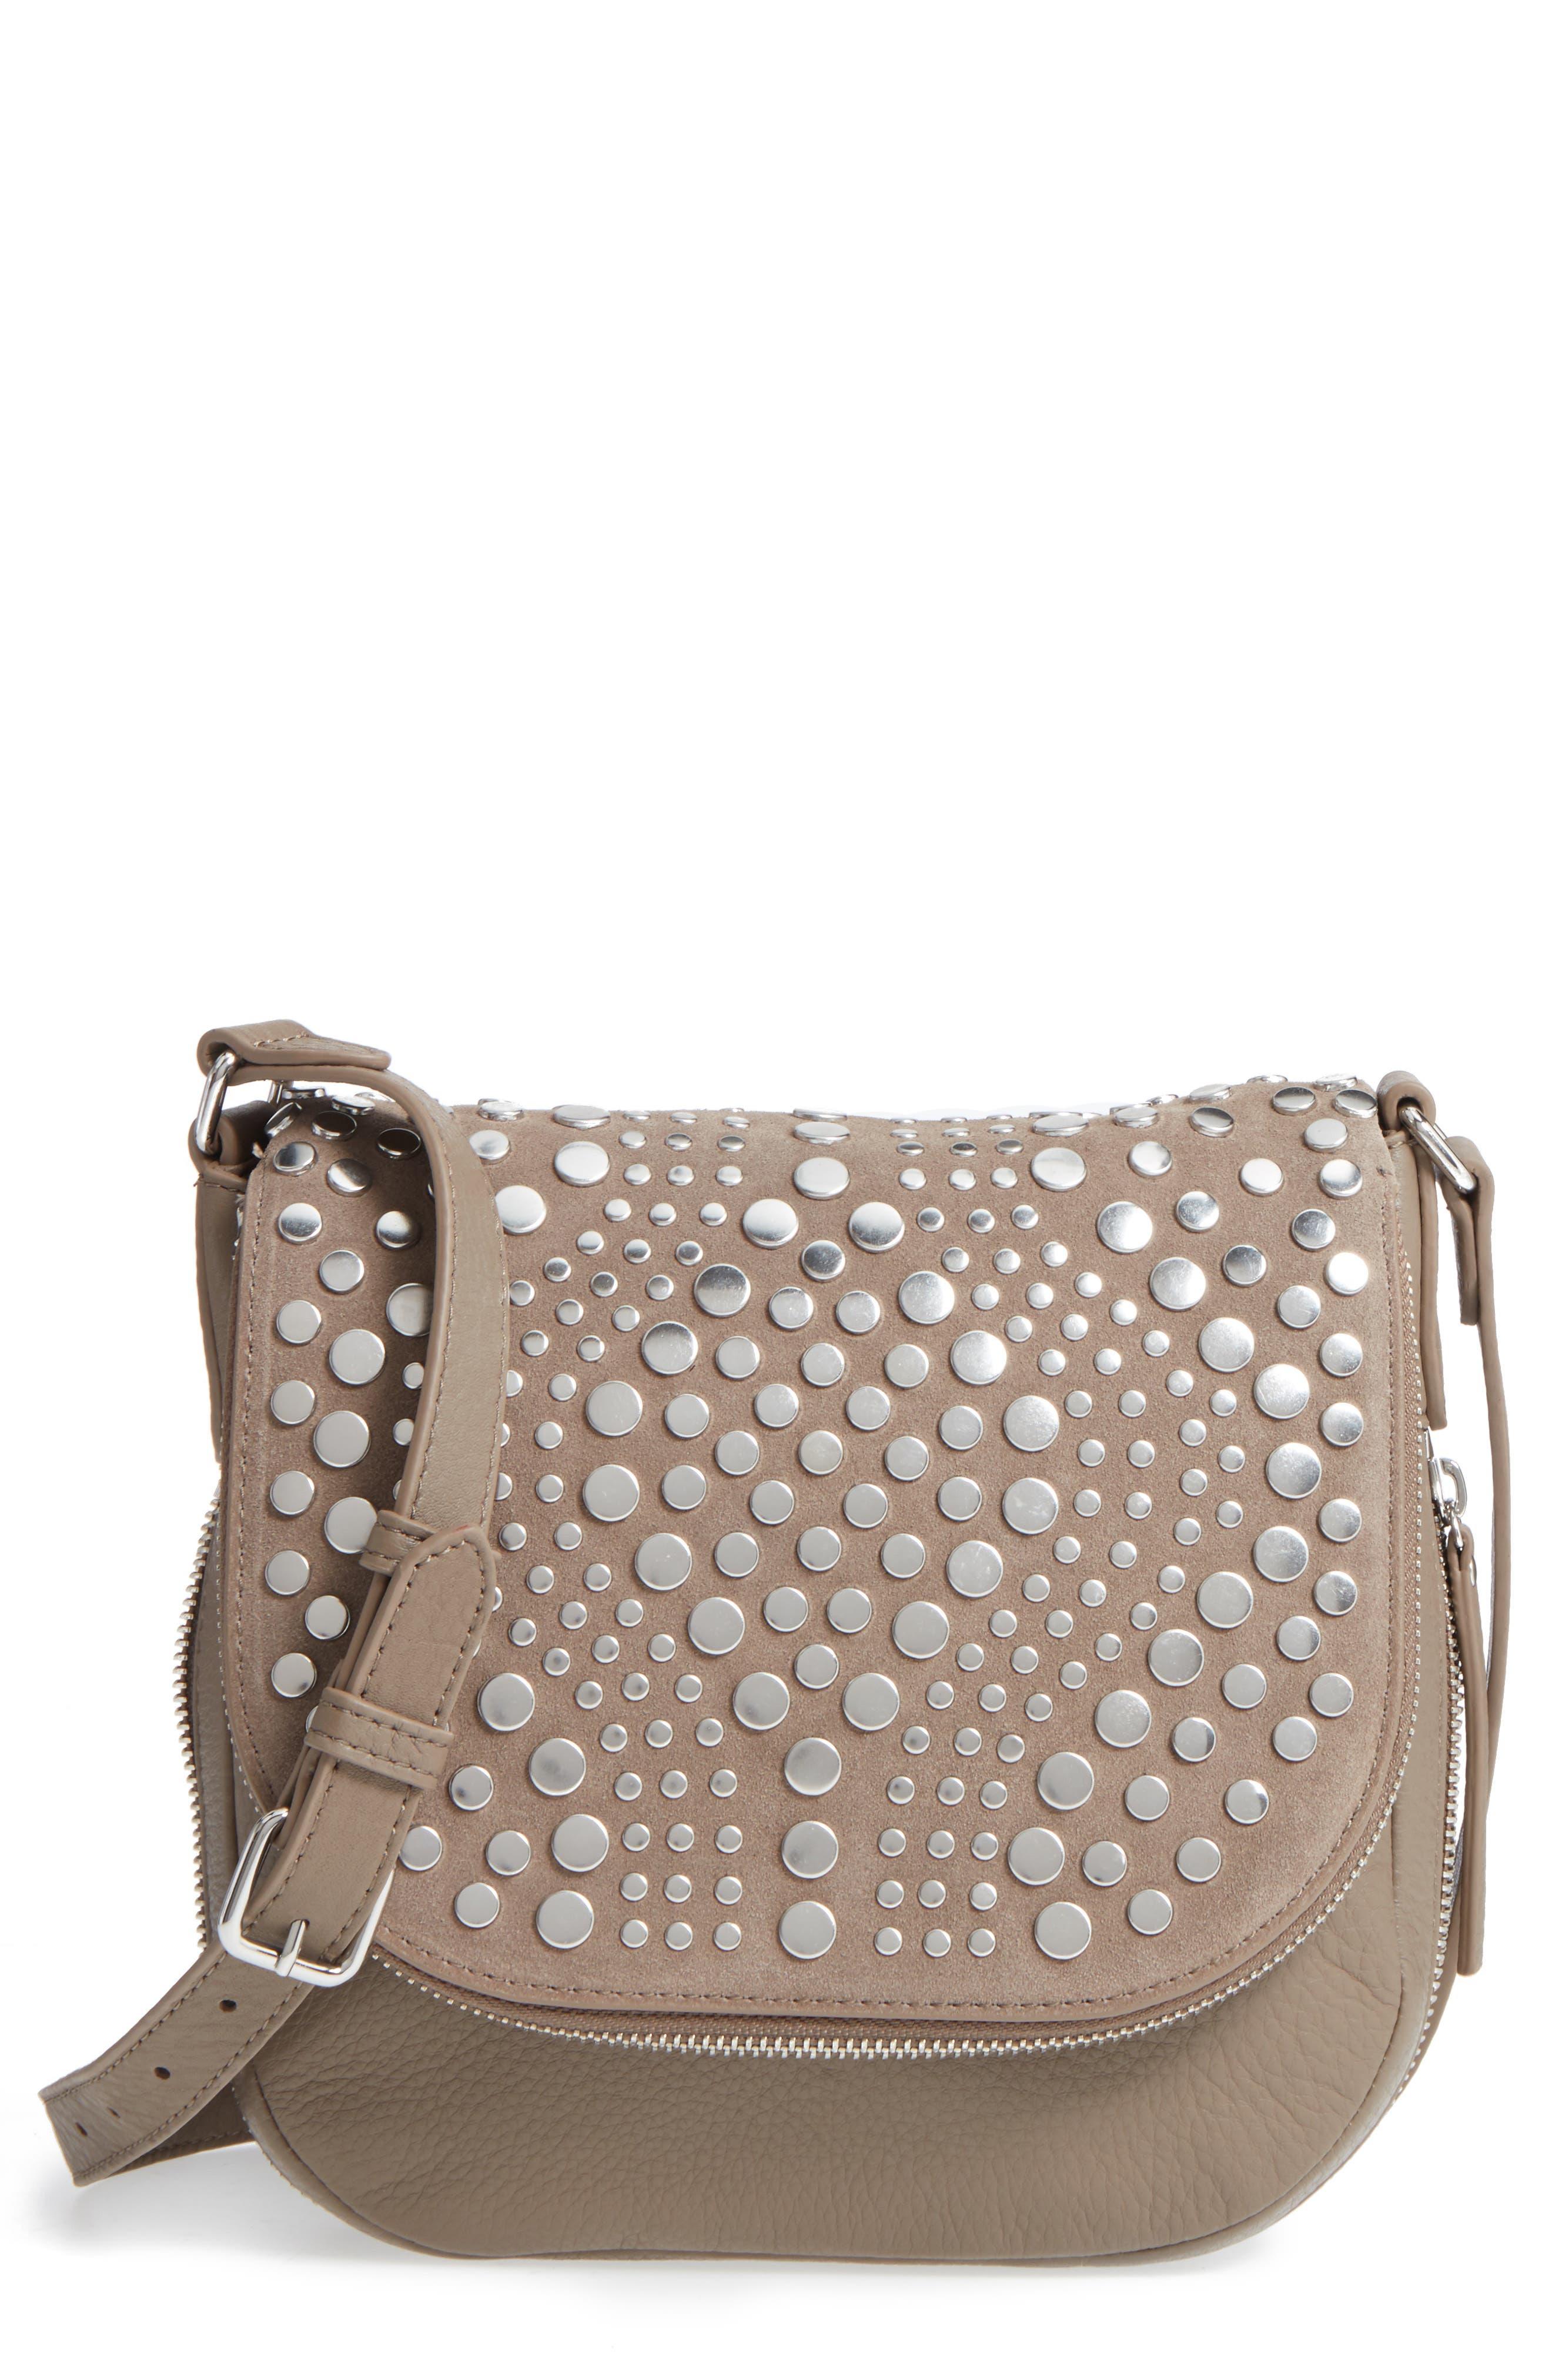 Vince Camuto Bonny Studded Leather Crossbody Bag